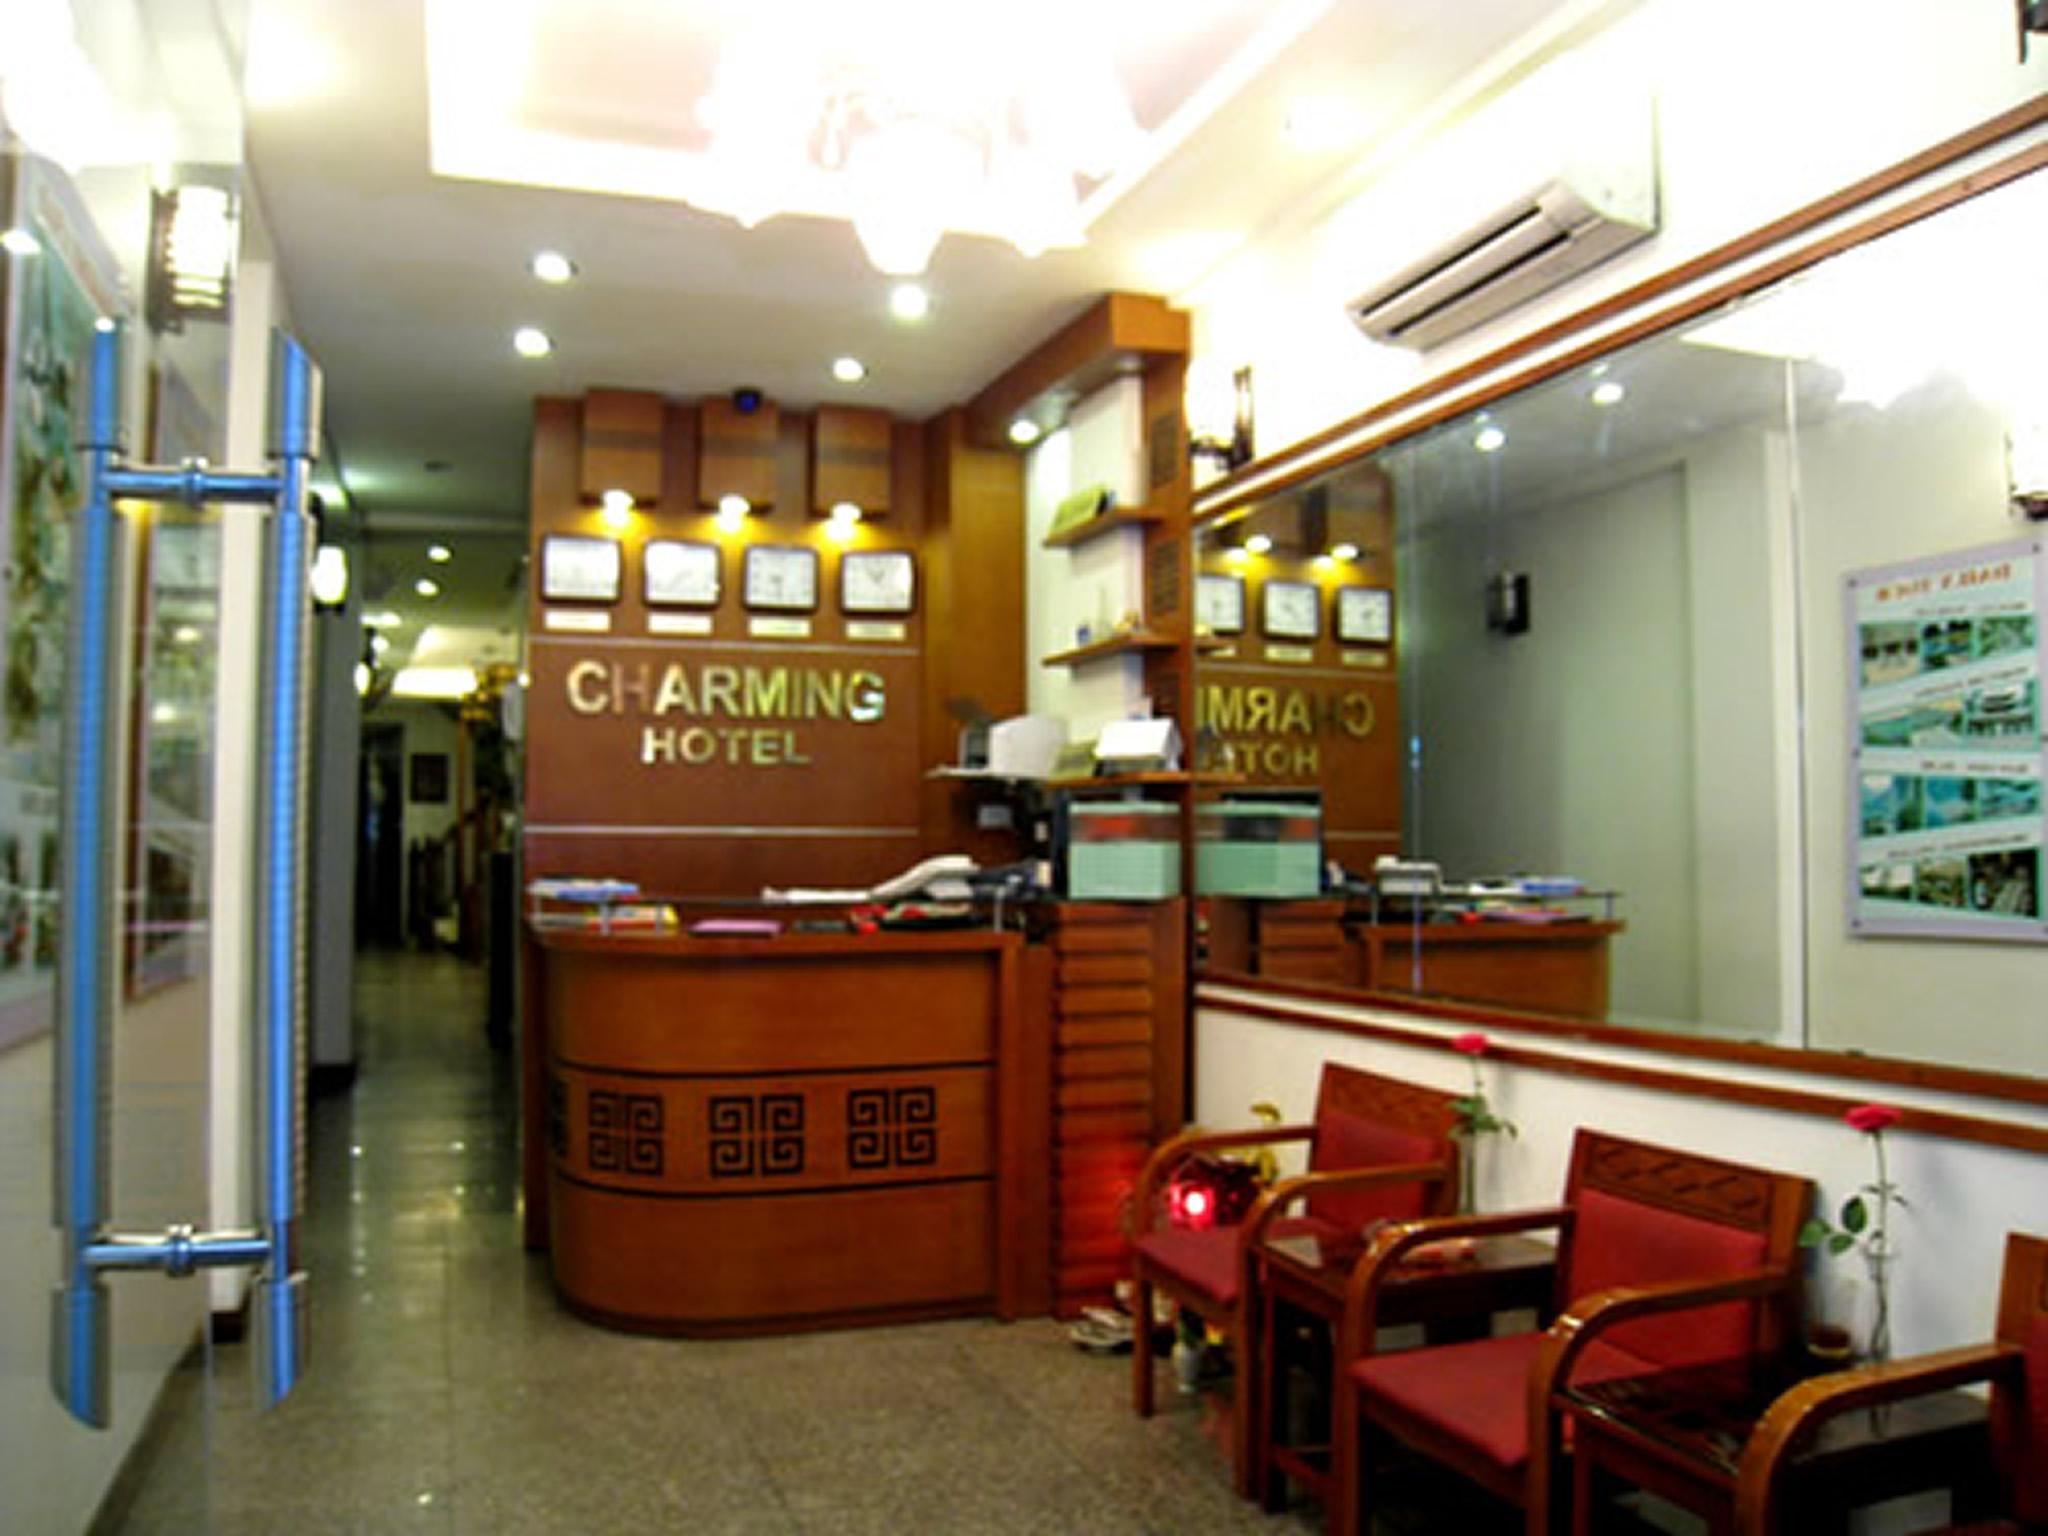 Charming Hotel Hanoi